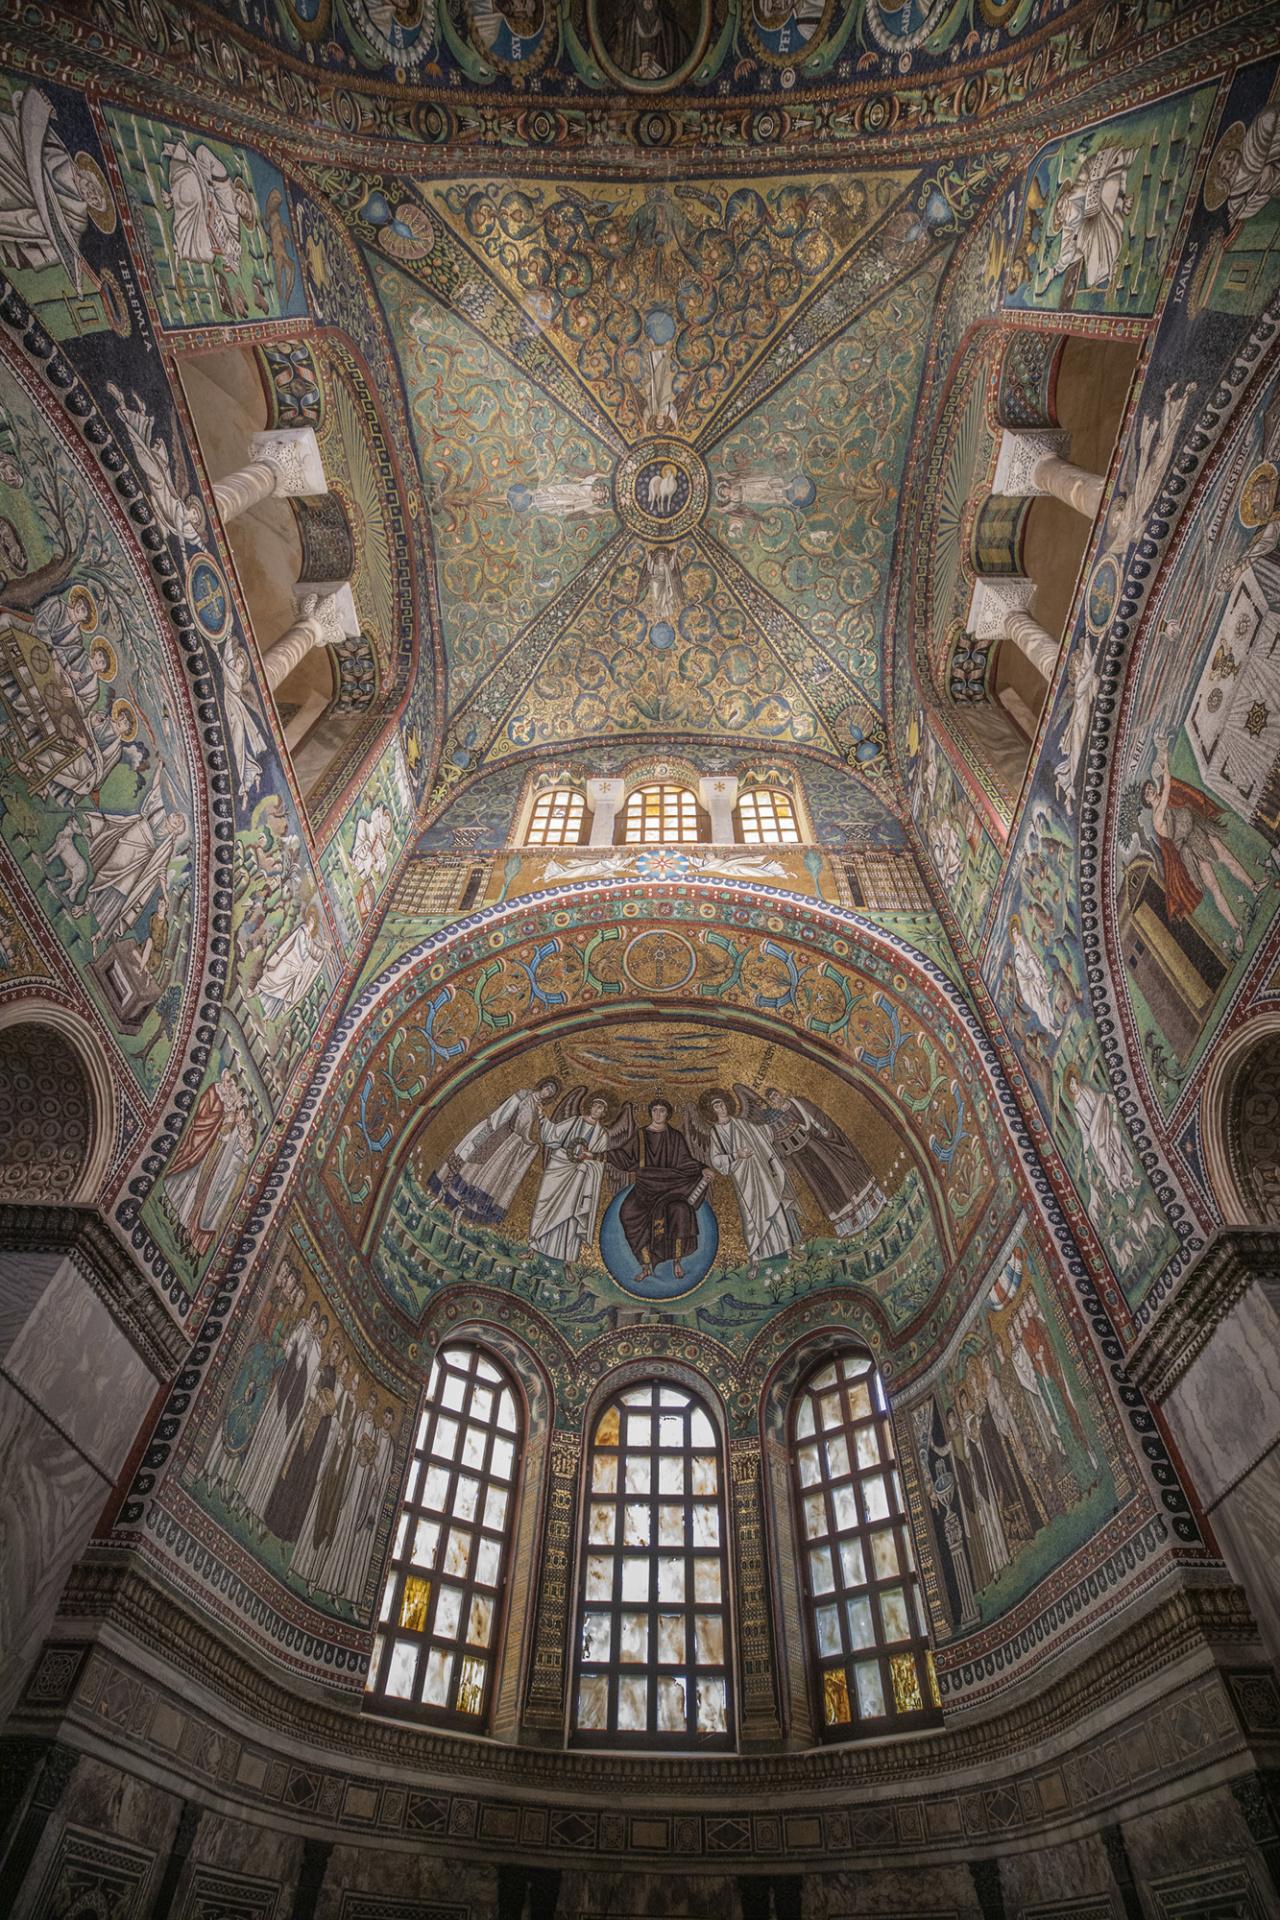 Kieran Dodds Ravenna commission for Penguin/Allen Lane, September 2020 Basilica di San Vitale, Ravenna, Italy.